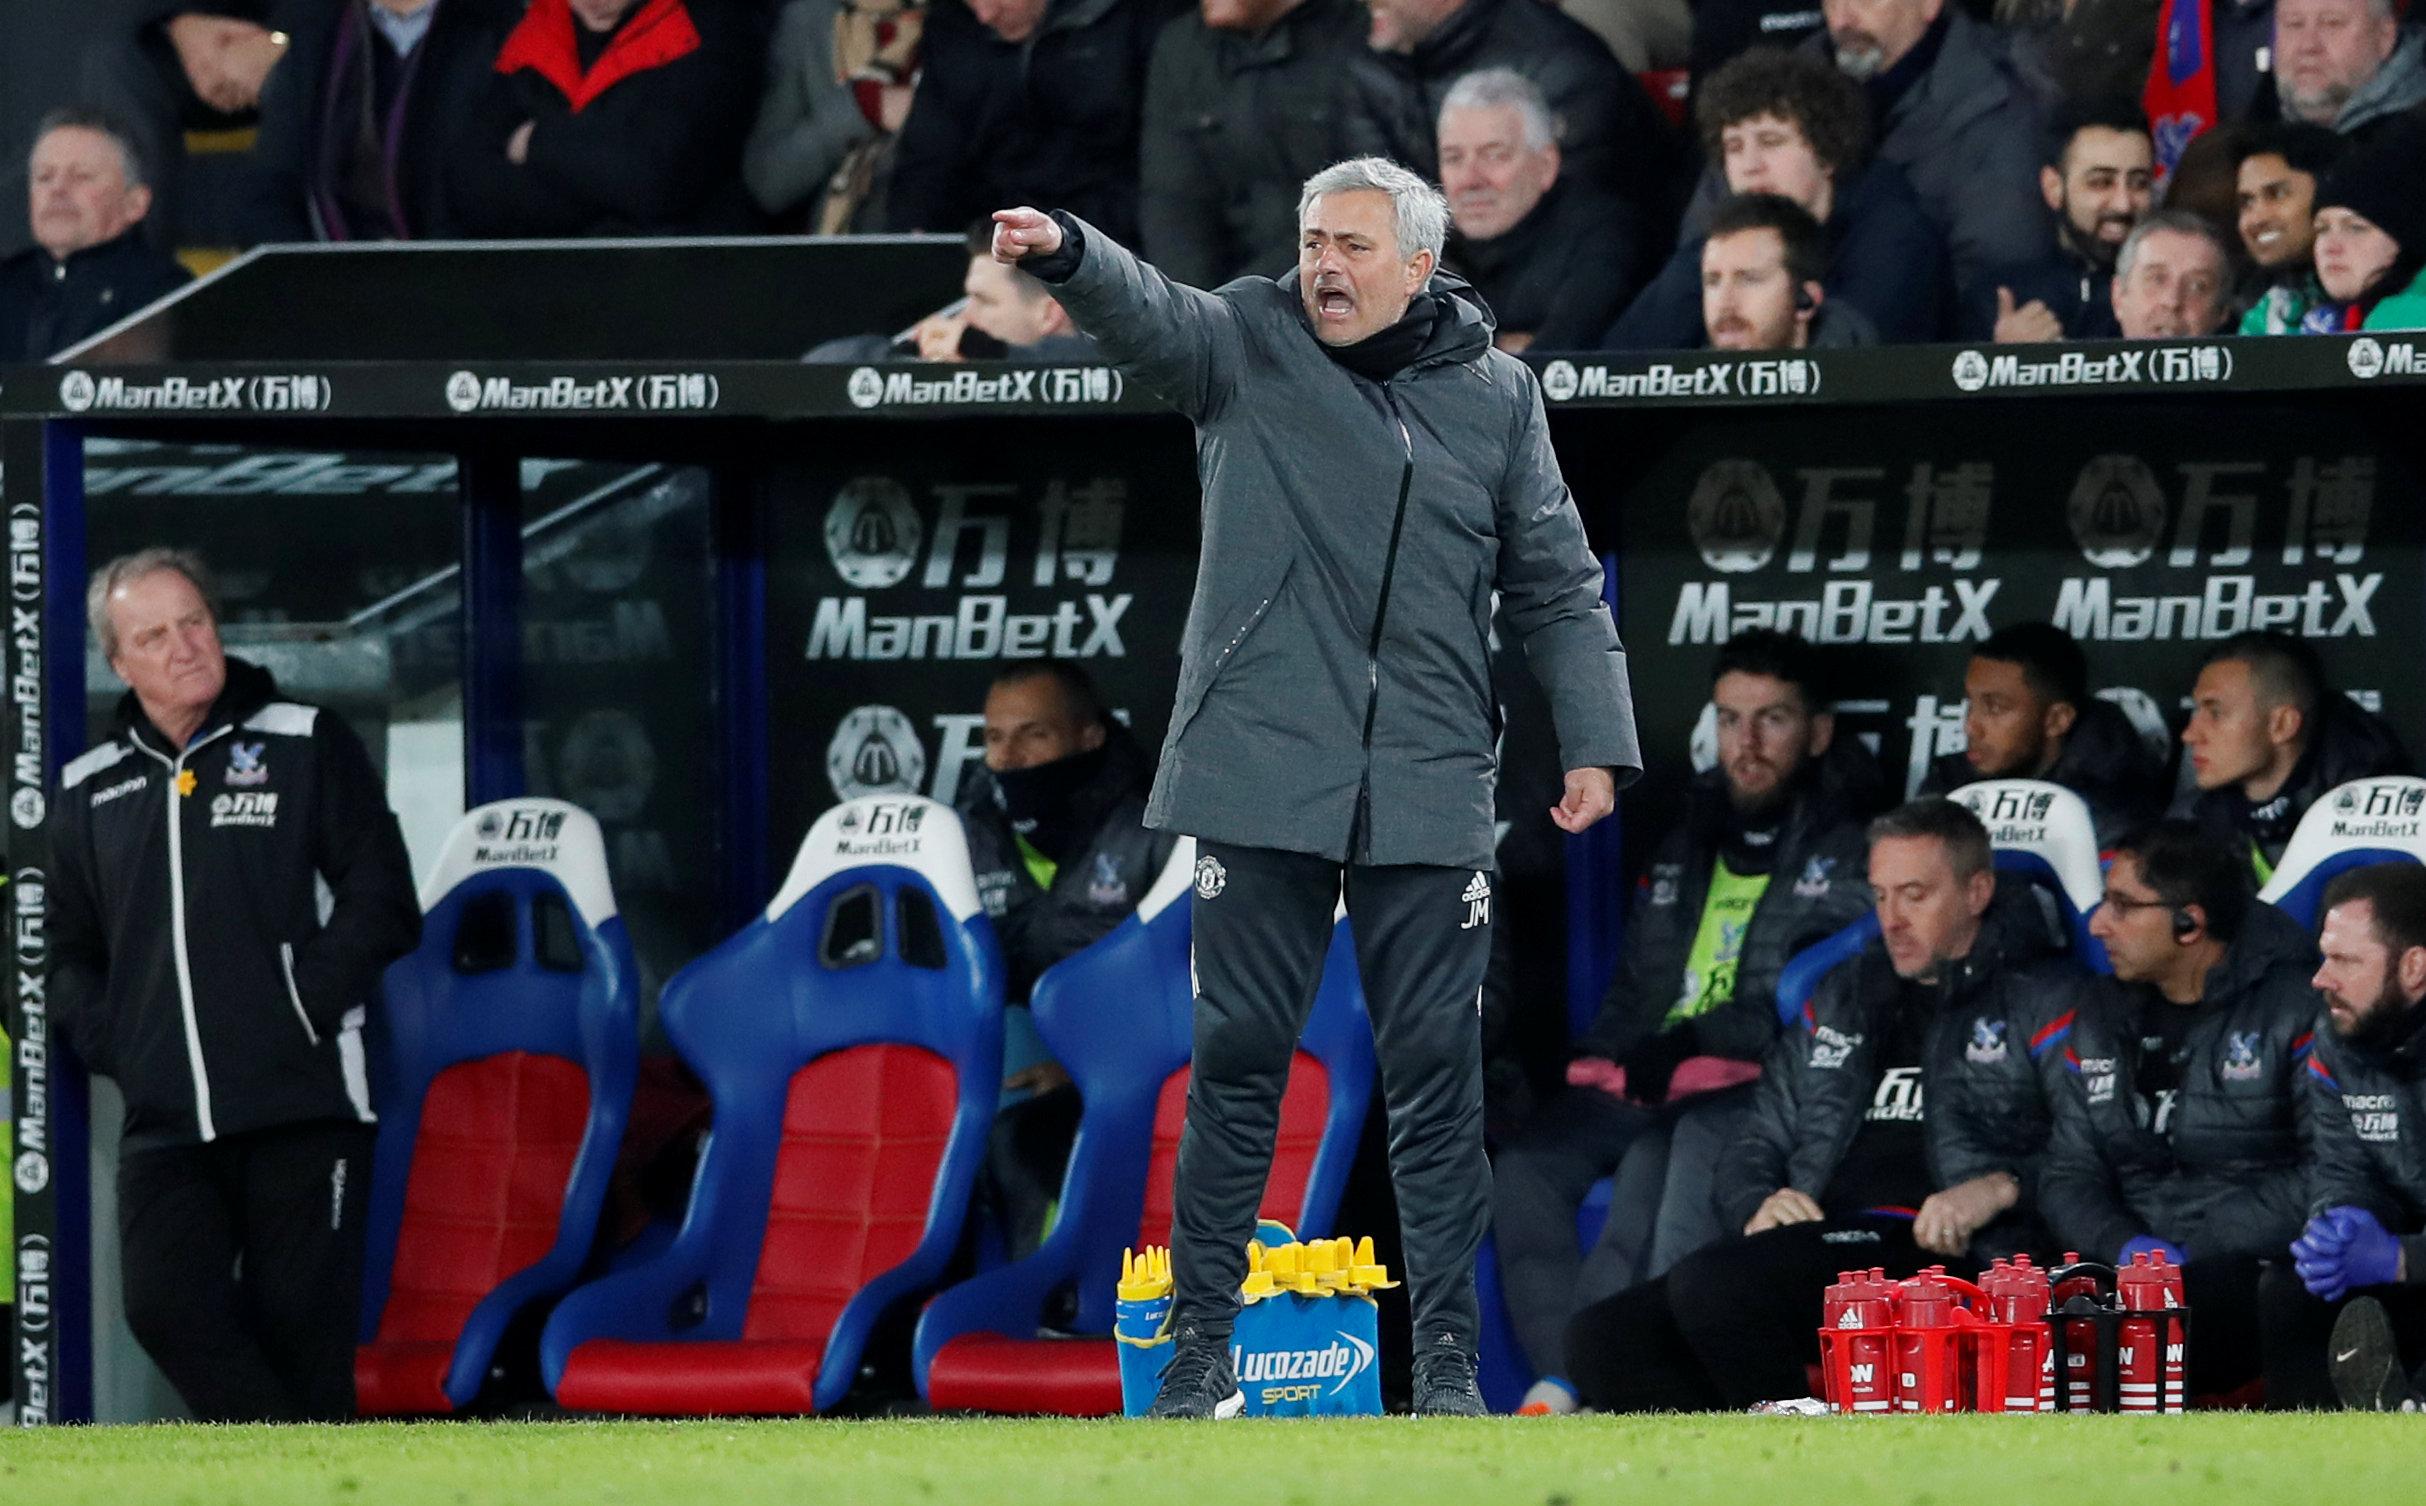 Man United won amazing match at Palace: Mourinho